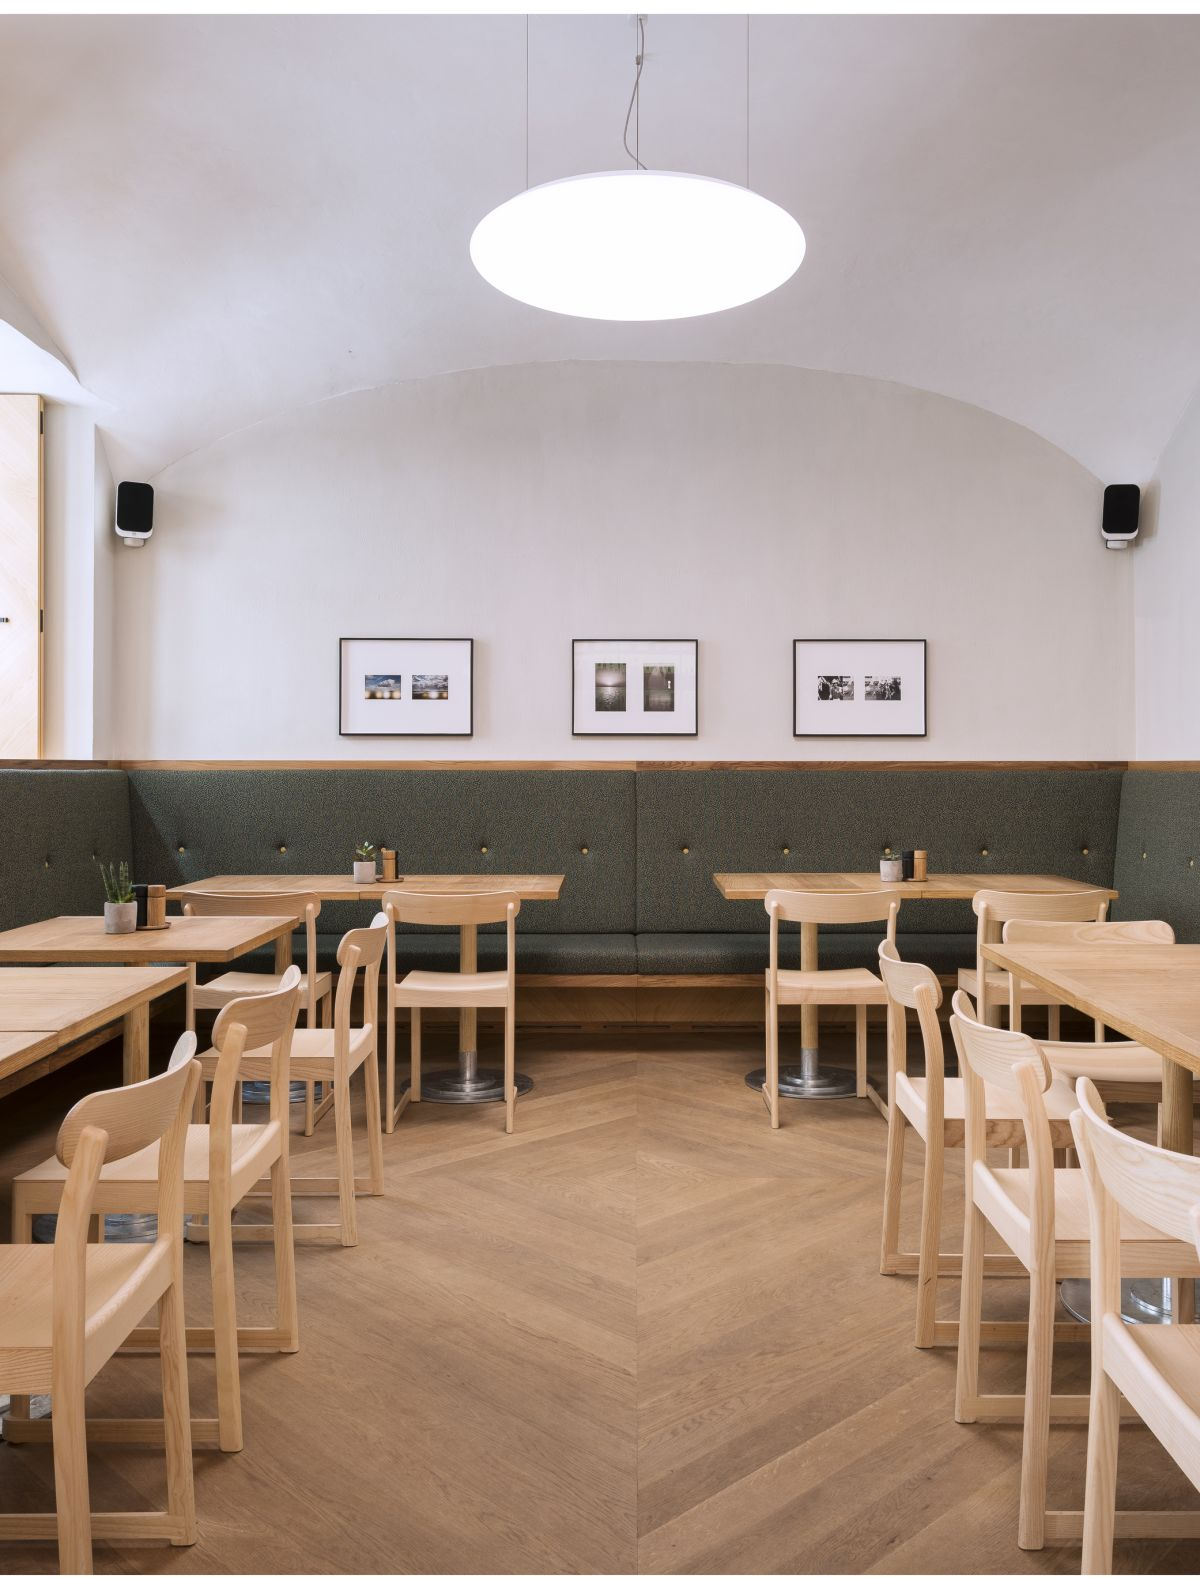 Café Kandl, Wien, Austria 2019